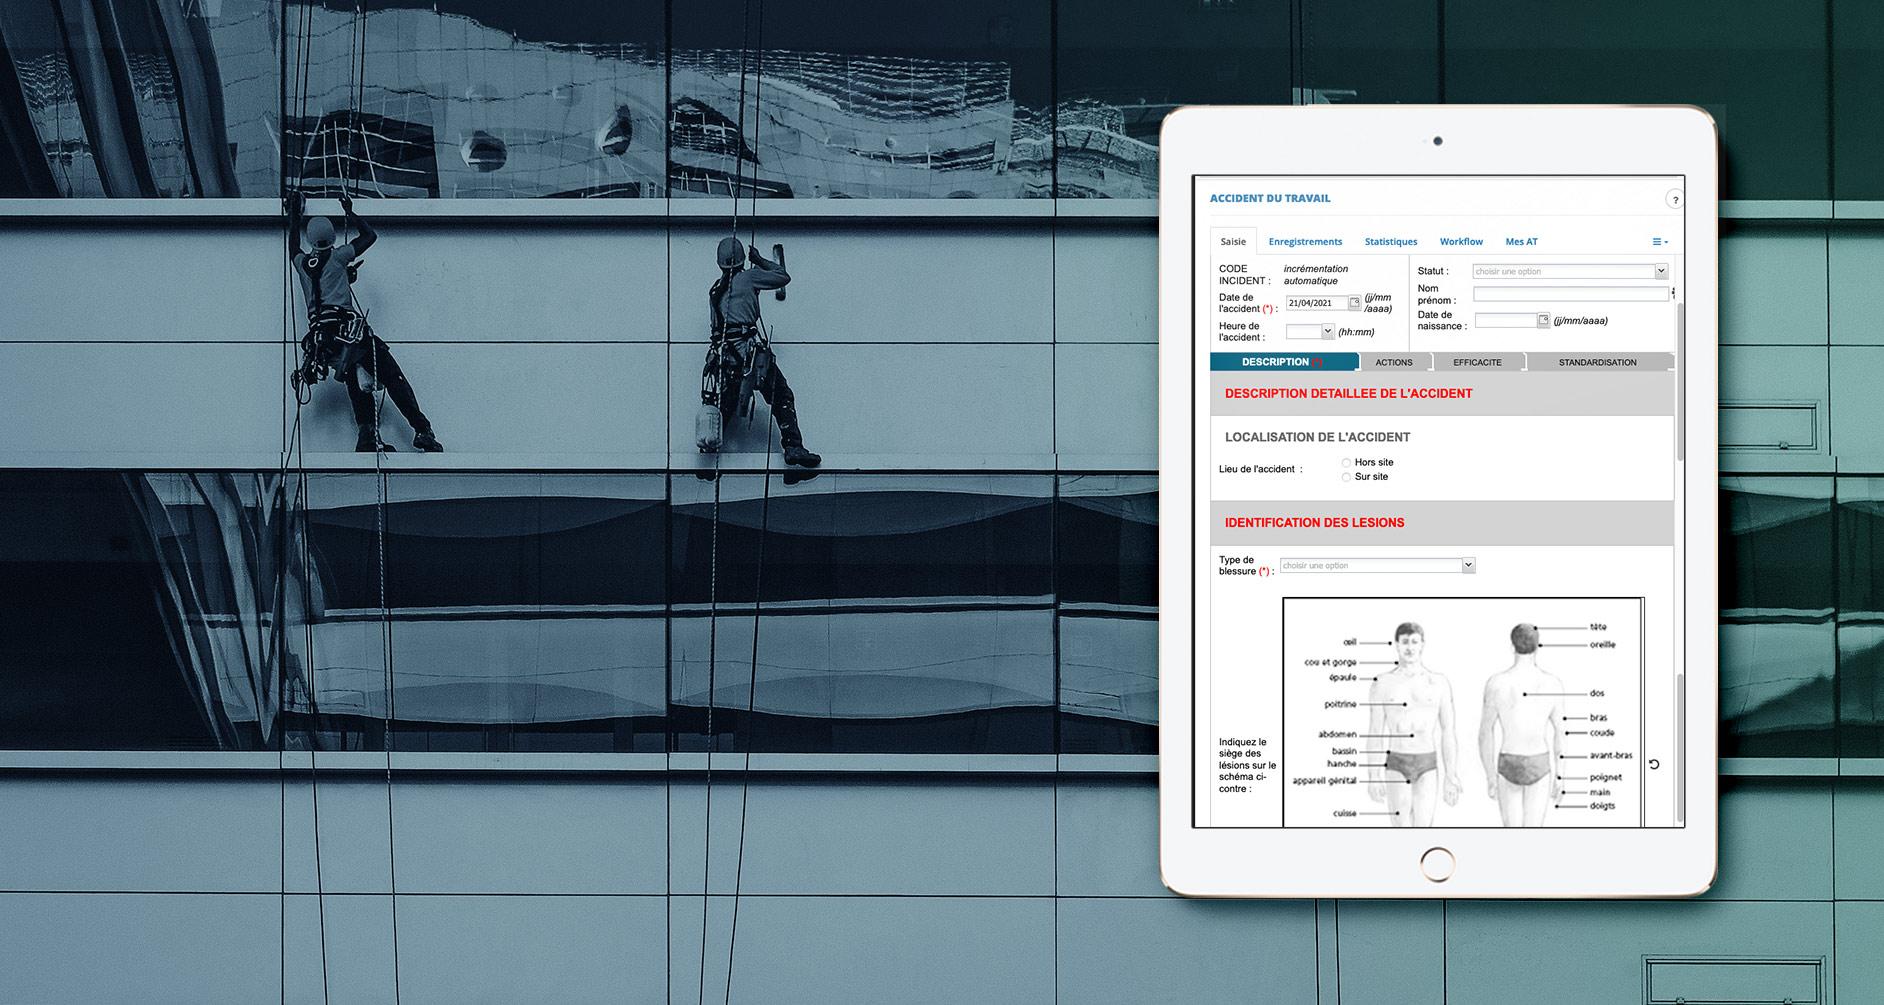 Aperçu de la version mobile de l'application AT MP de BlueKanGo Canada